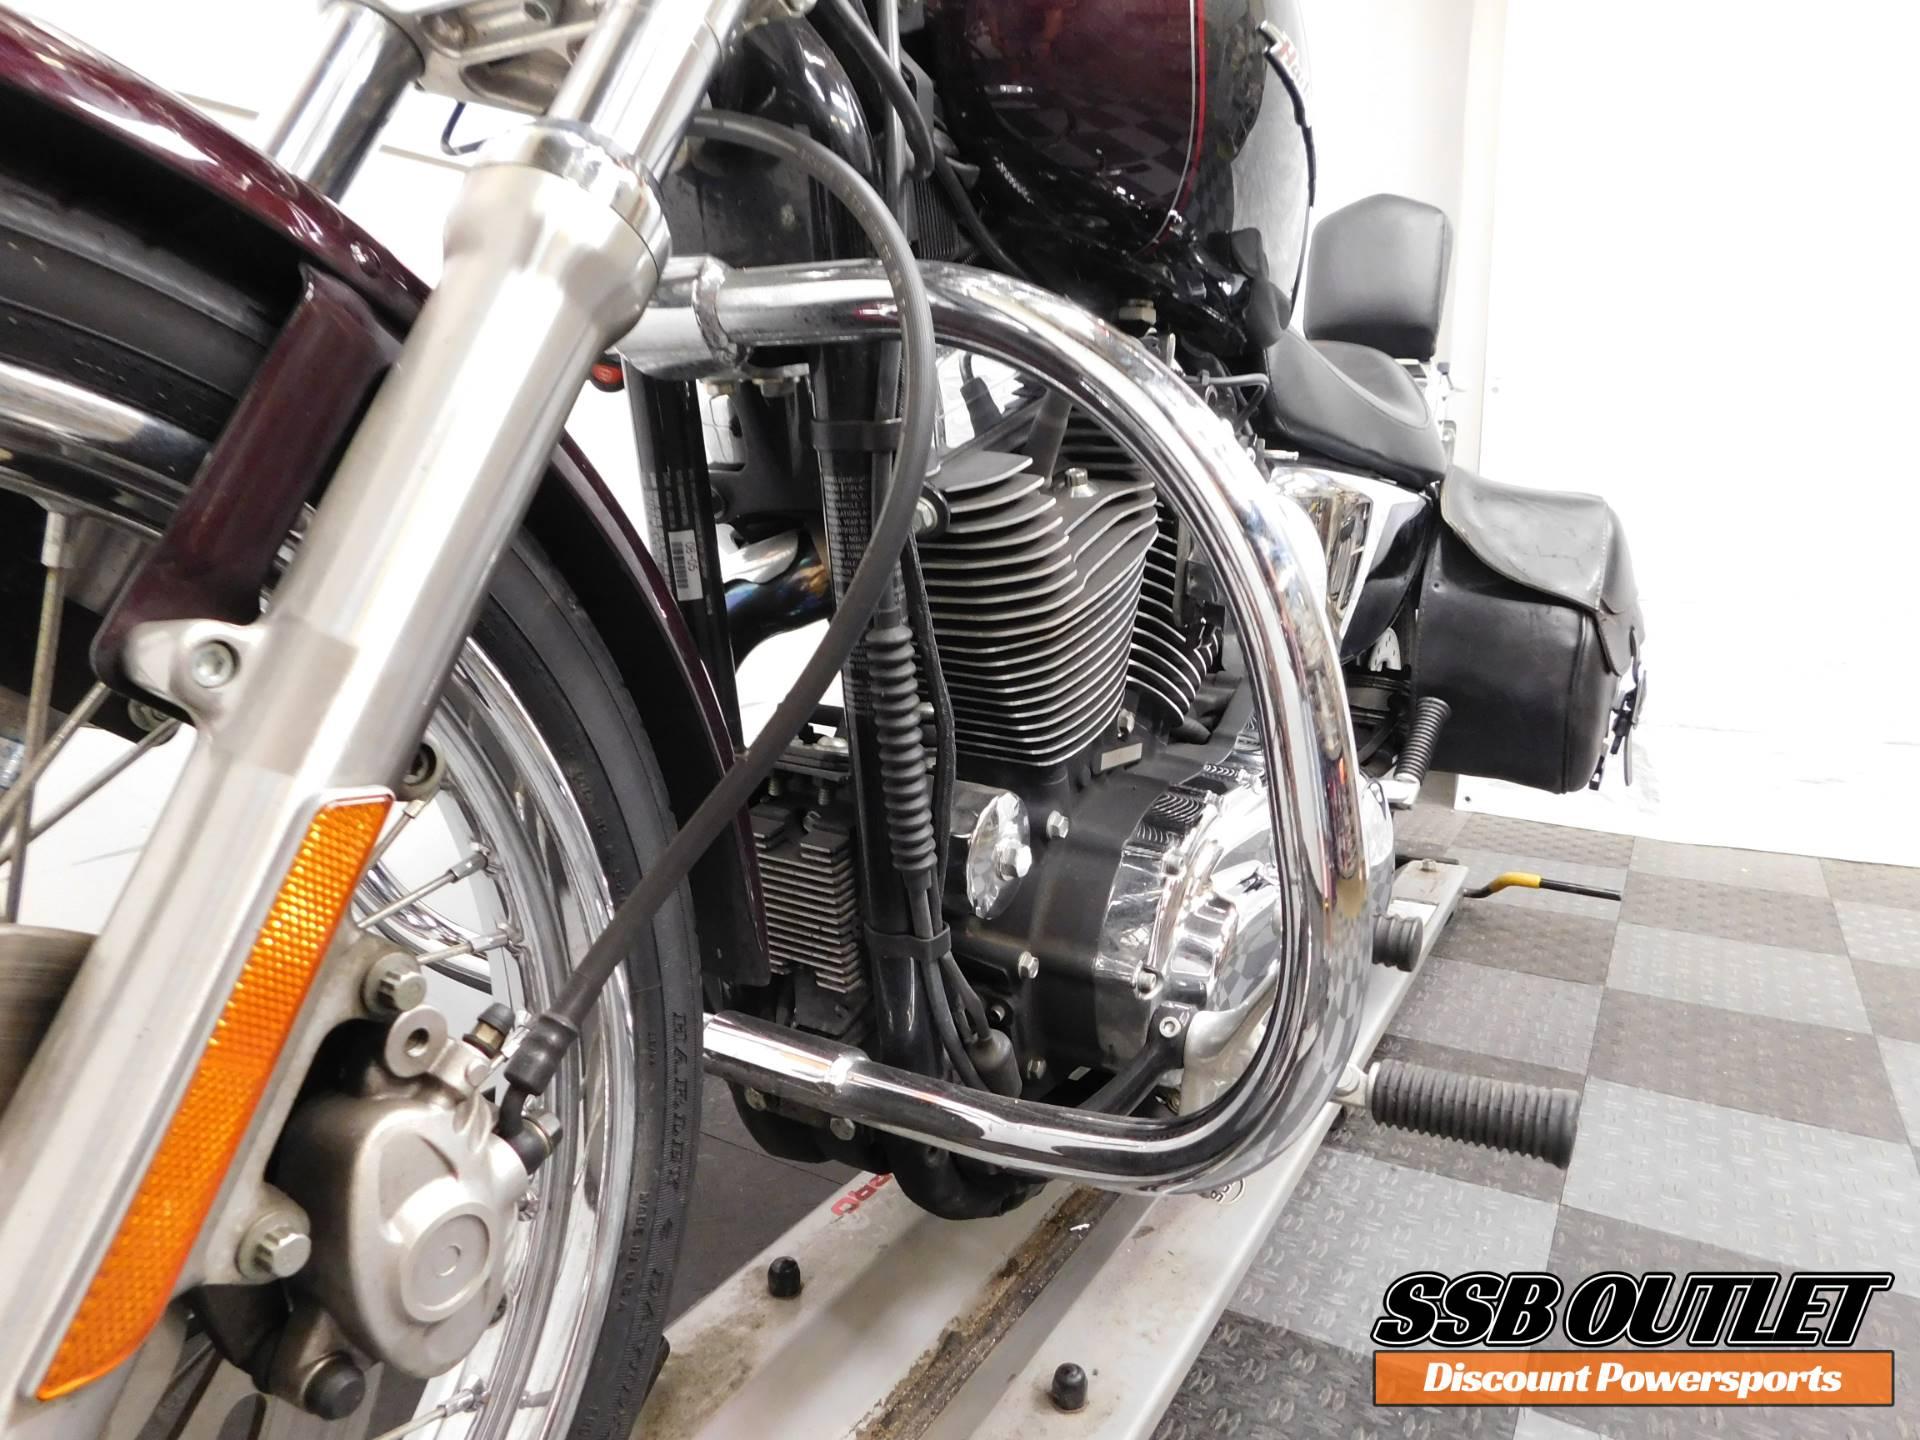 2006 Harley-Davidson Sportster 1200 Custom 10